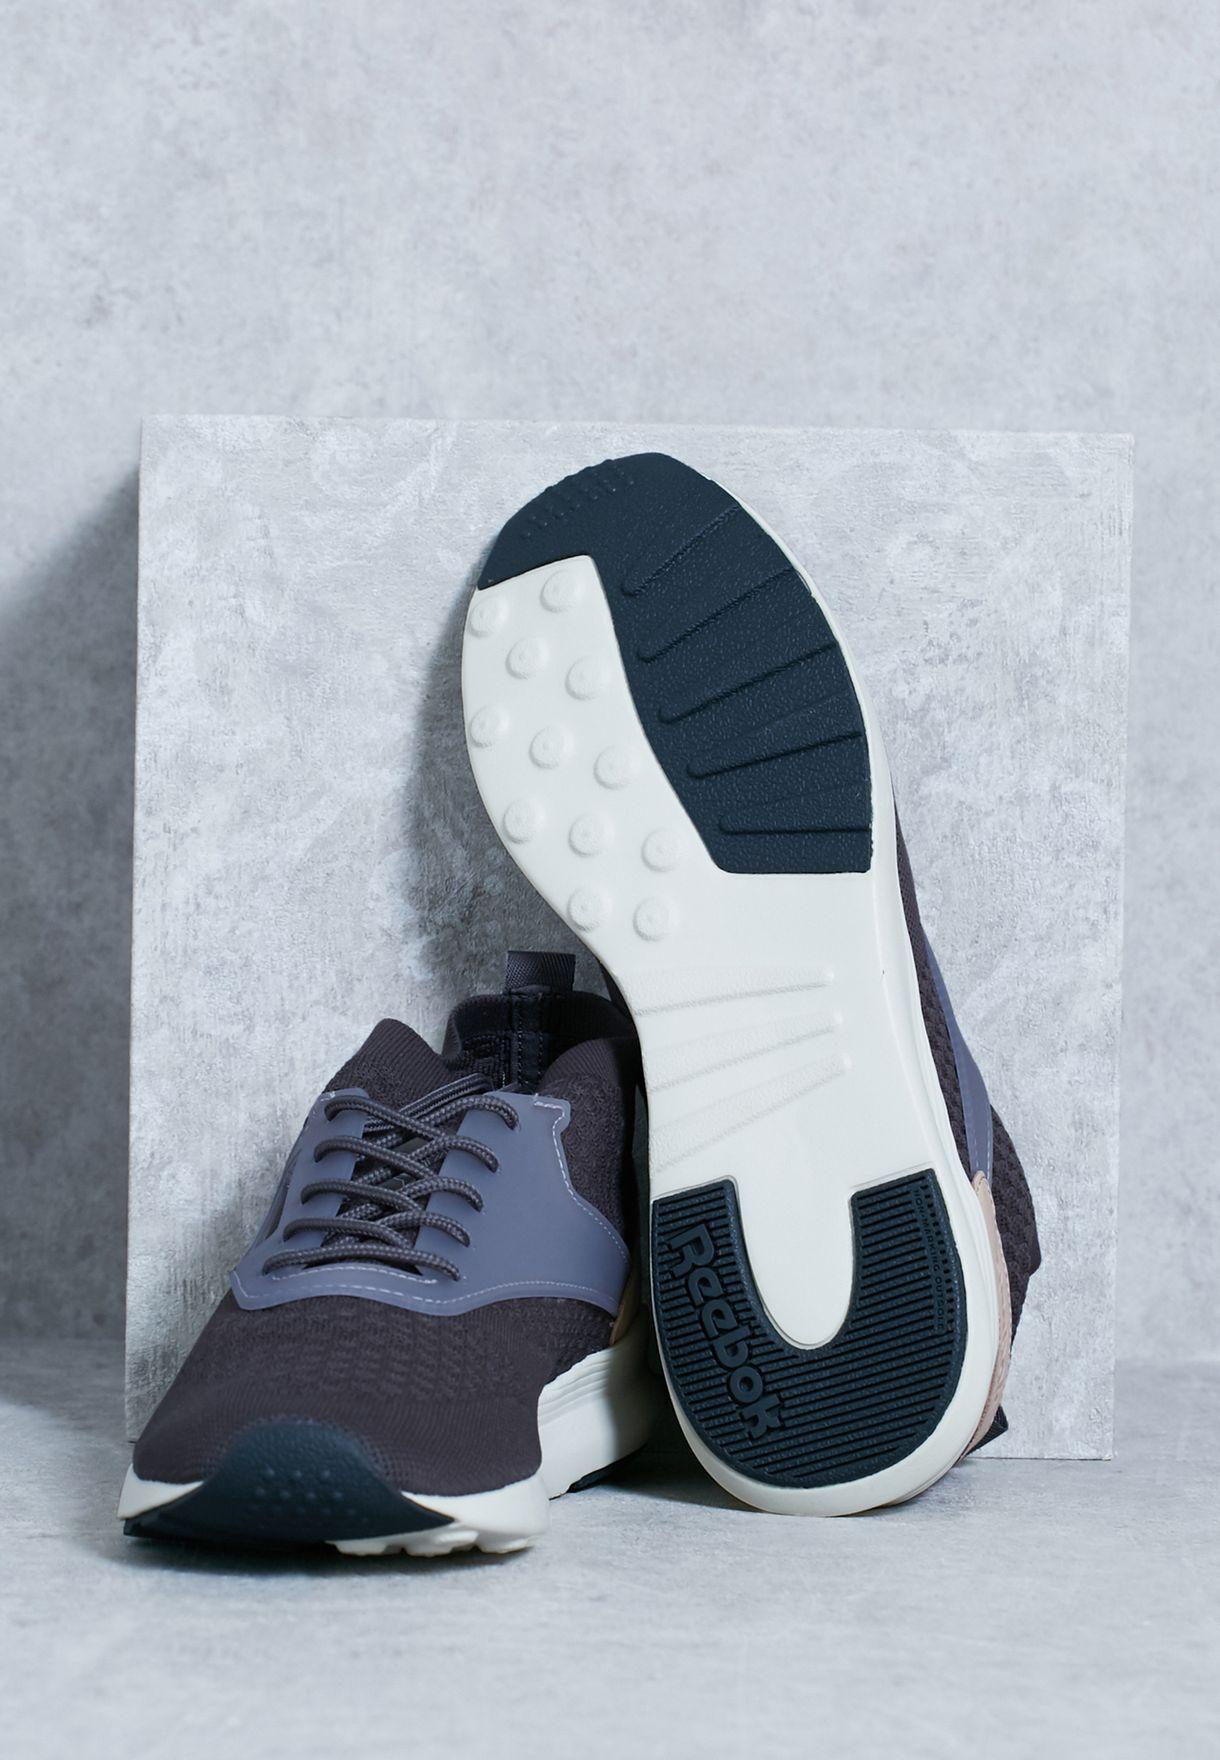 d69b81810b3 Shop Reebok grey Zoku Runner Ultk Lux BD4334 for Men in Qatar ...